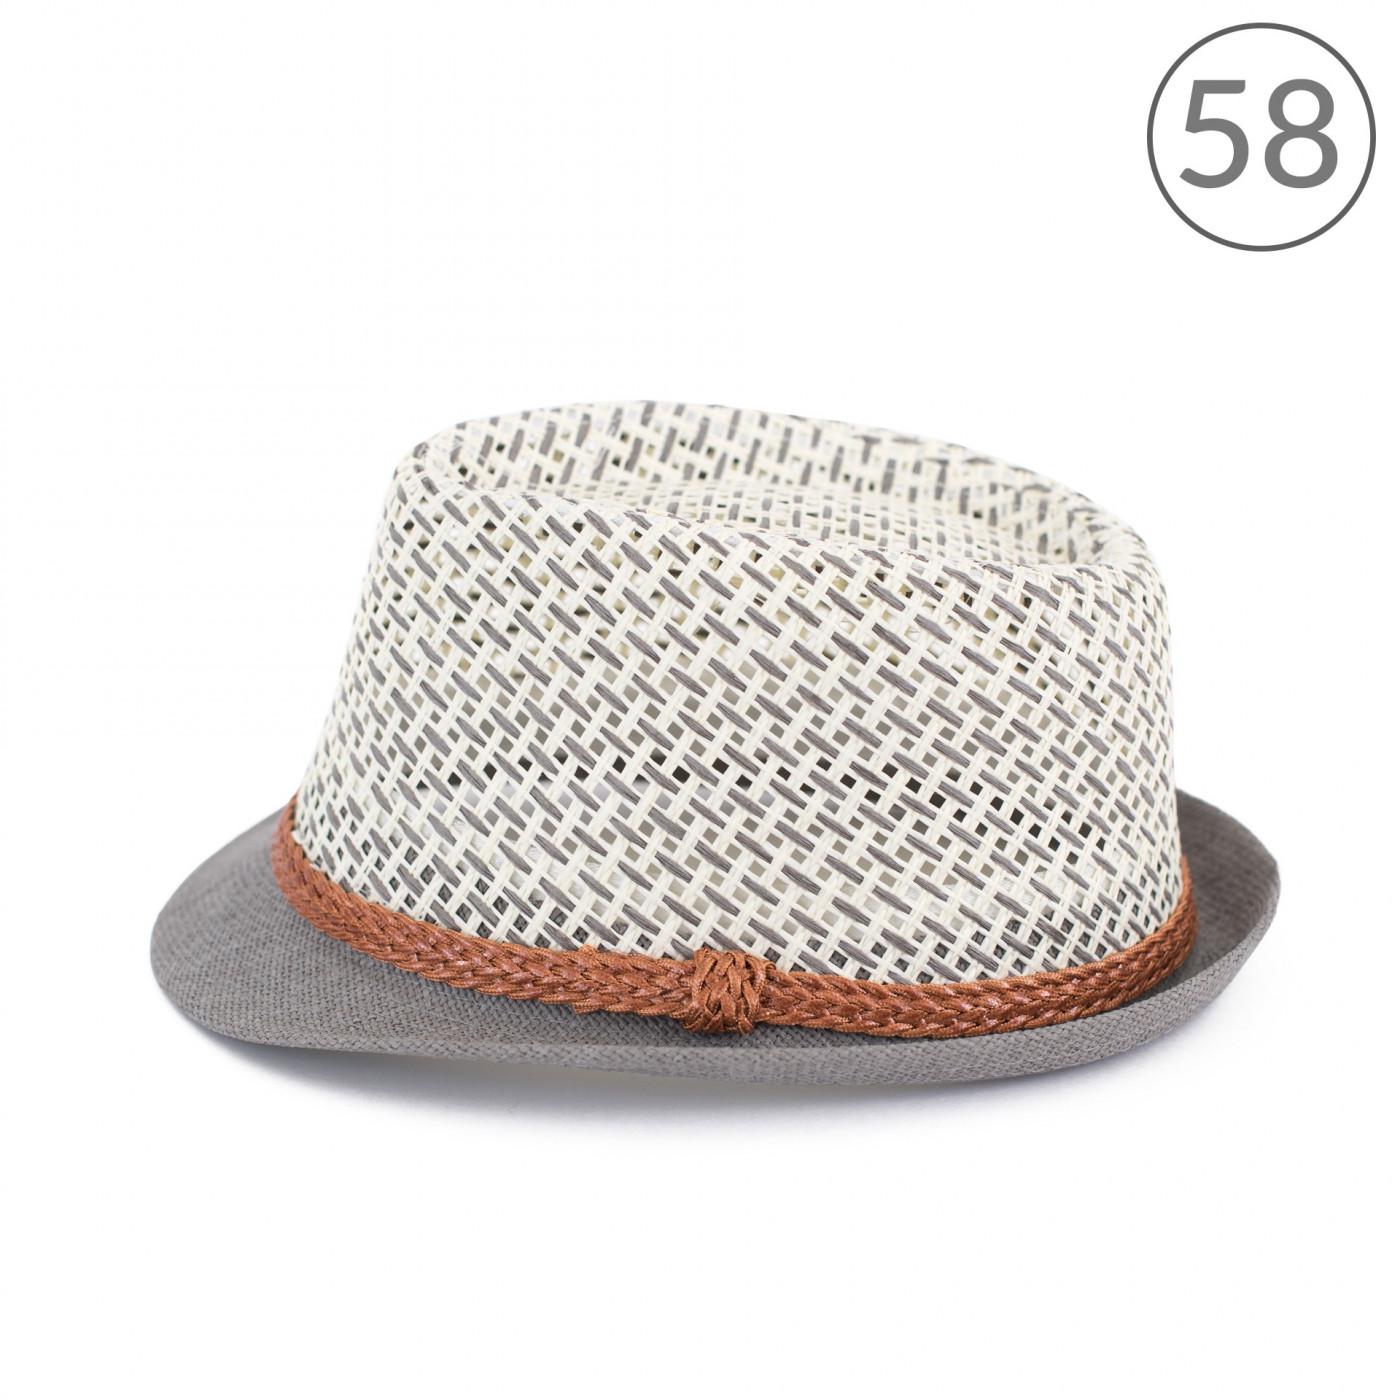 Art Of Polo Unisex's Hat cz19277